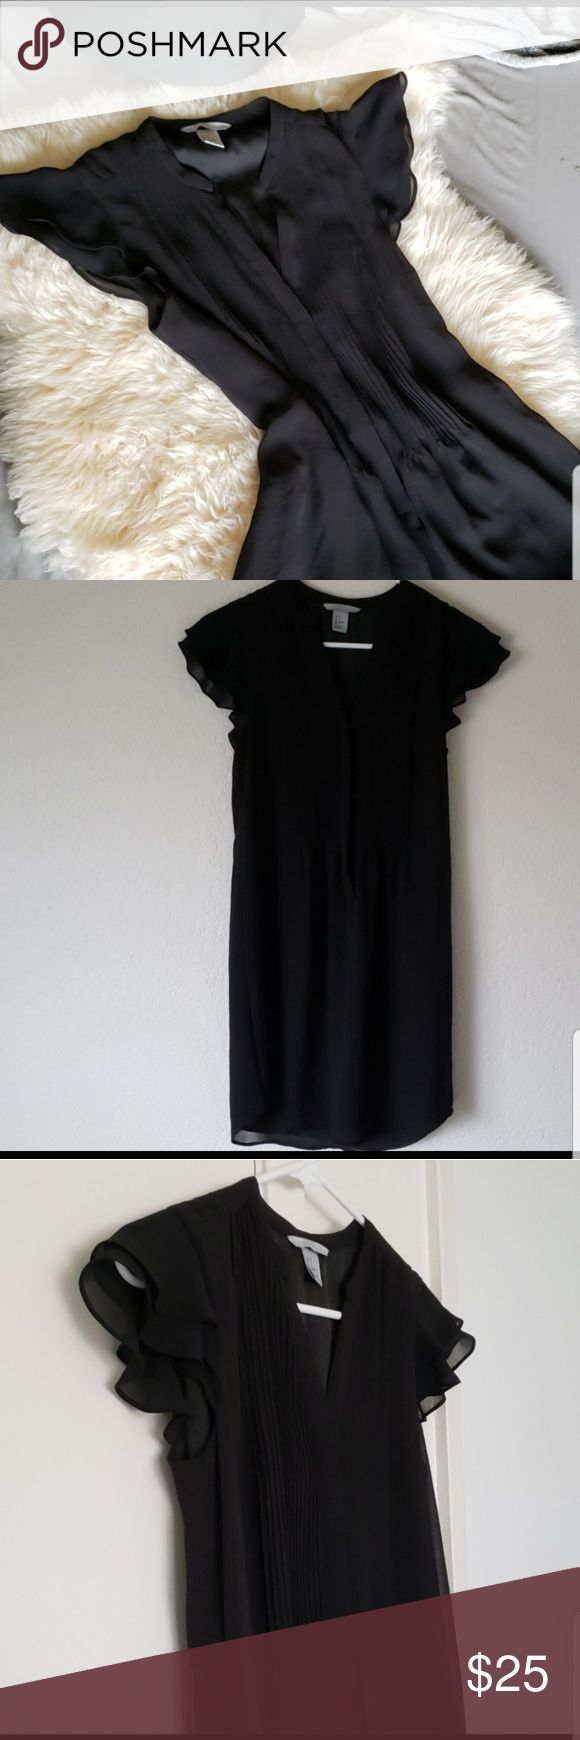 H&M Little black dress Perfect little black dress Features sheer ruffle sleeves ... 2